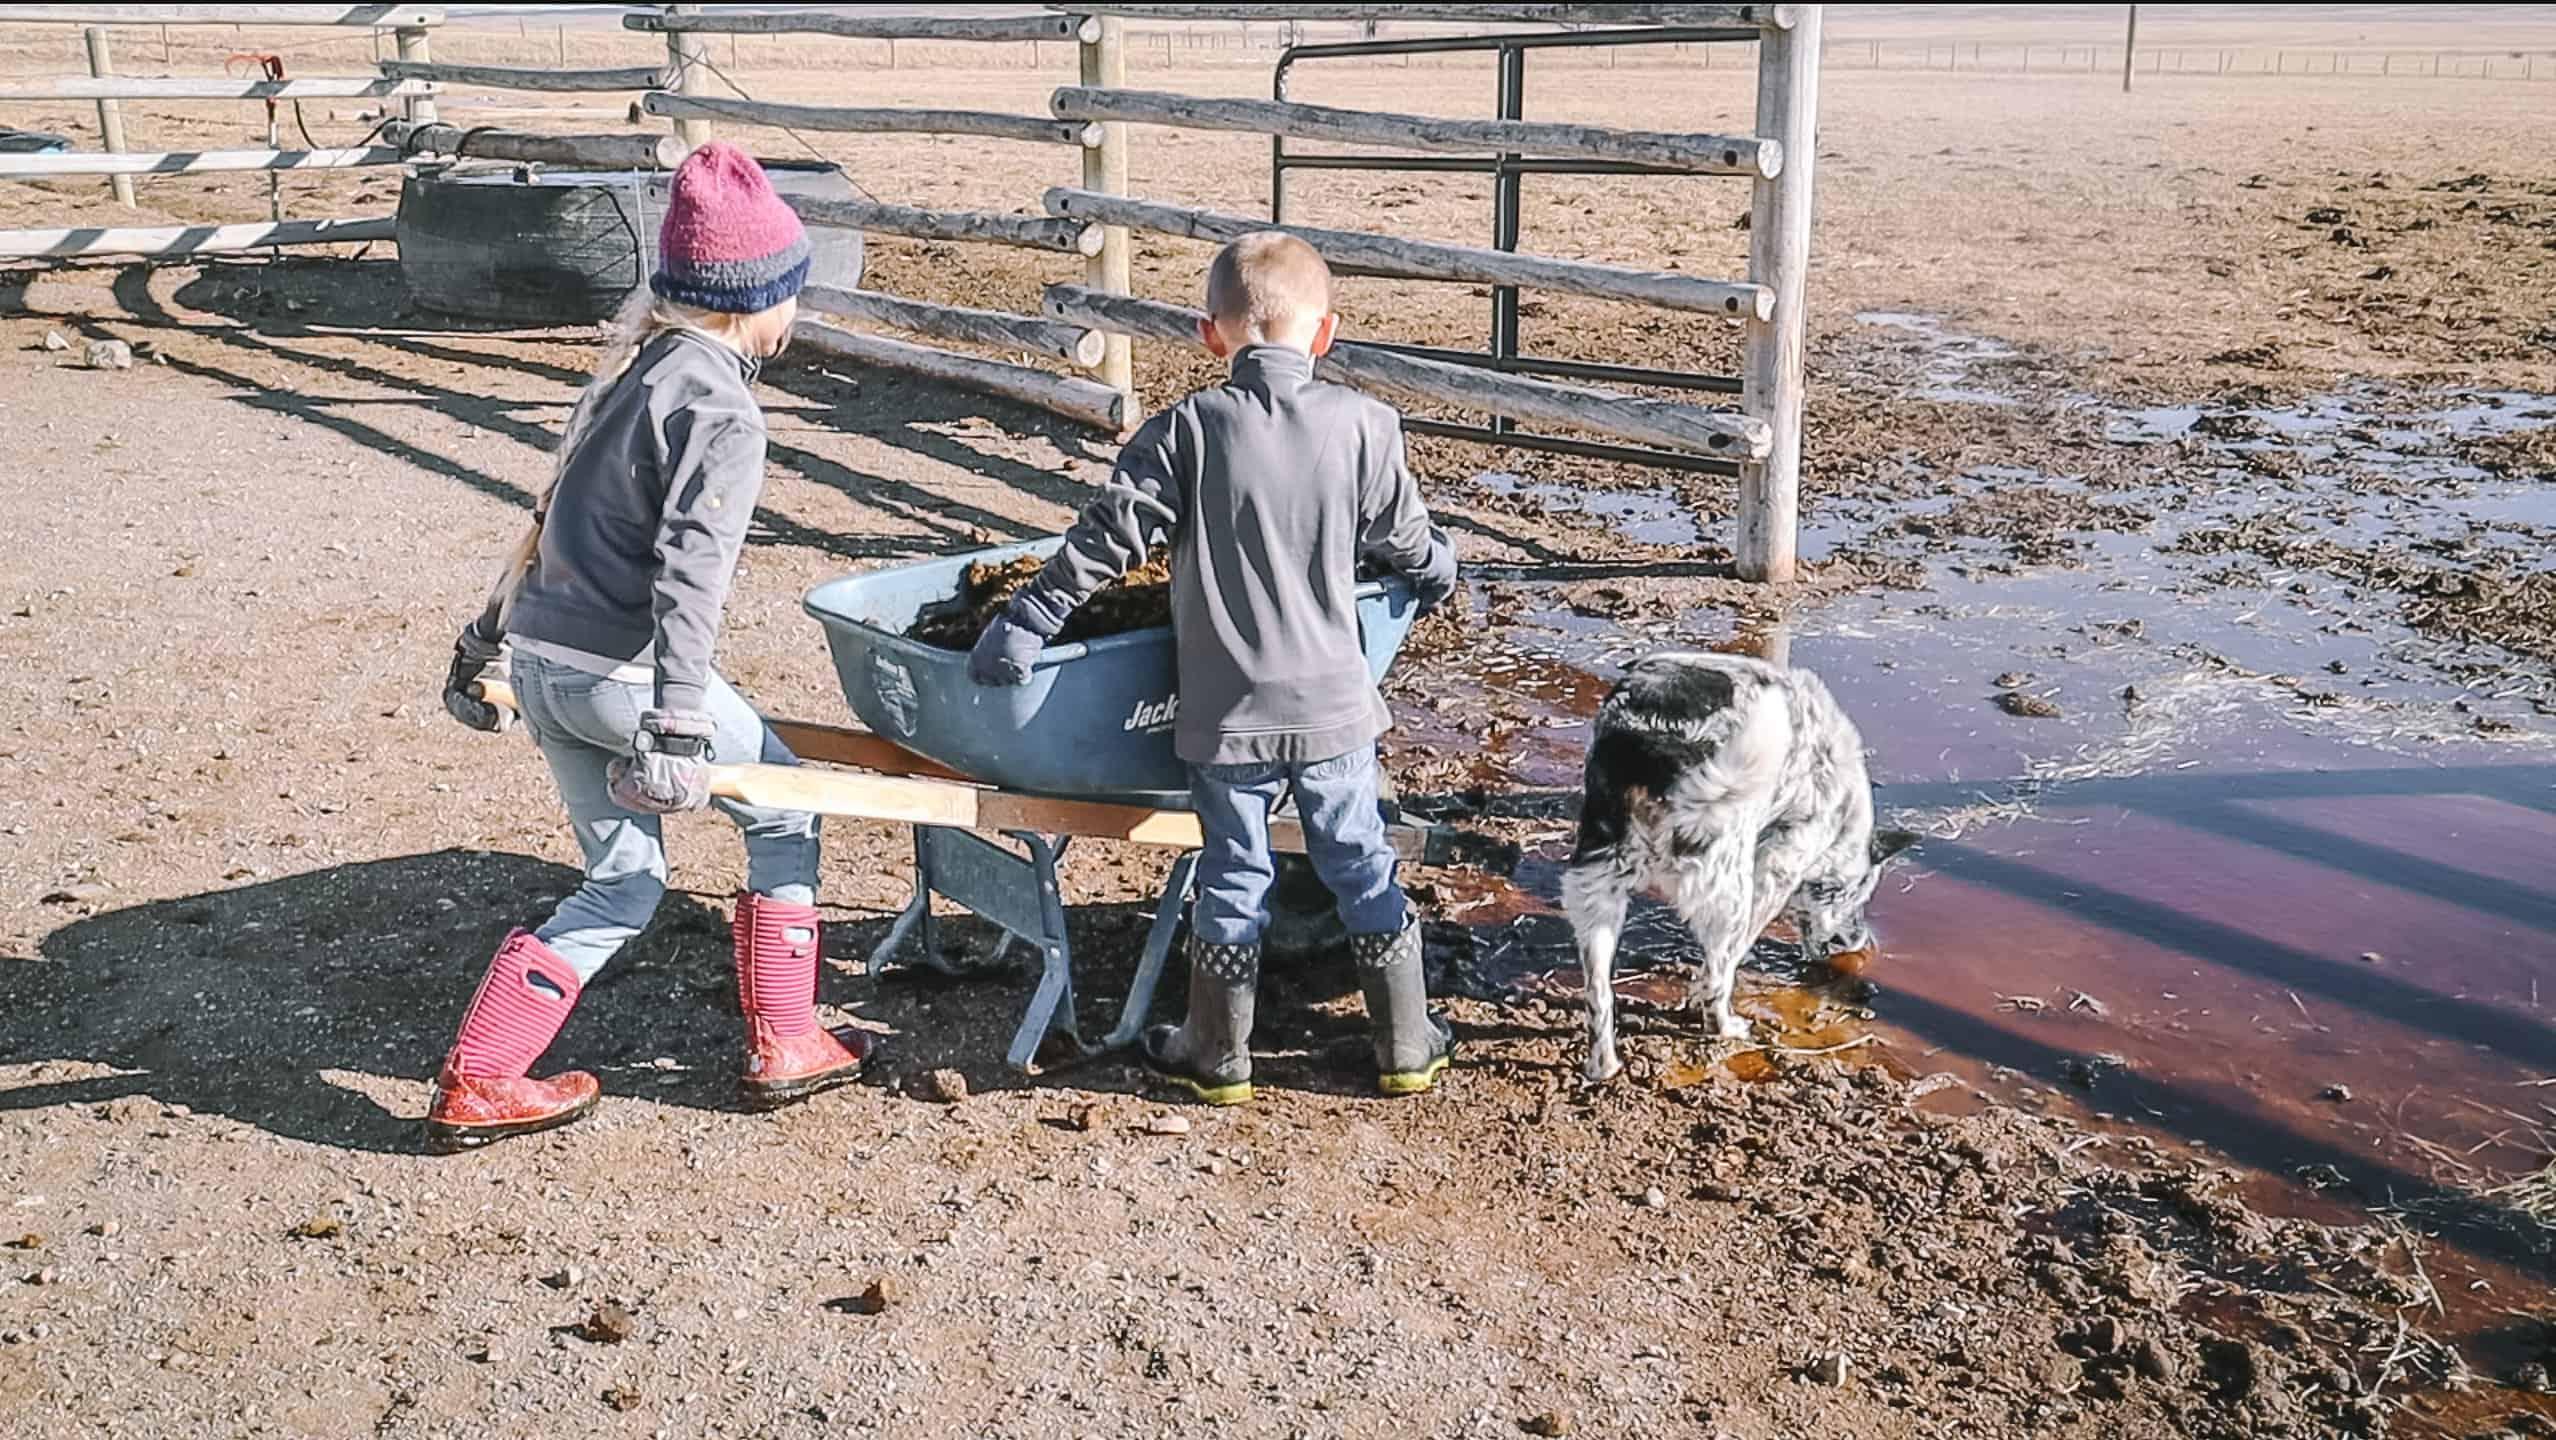 raising old-fashioned kids